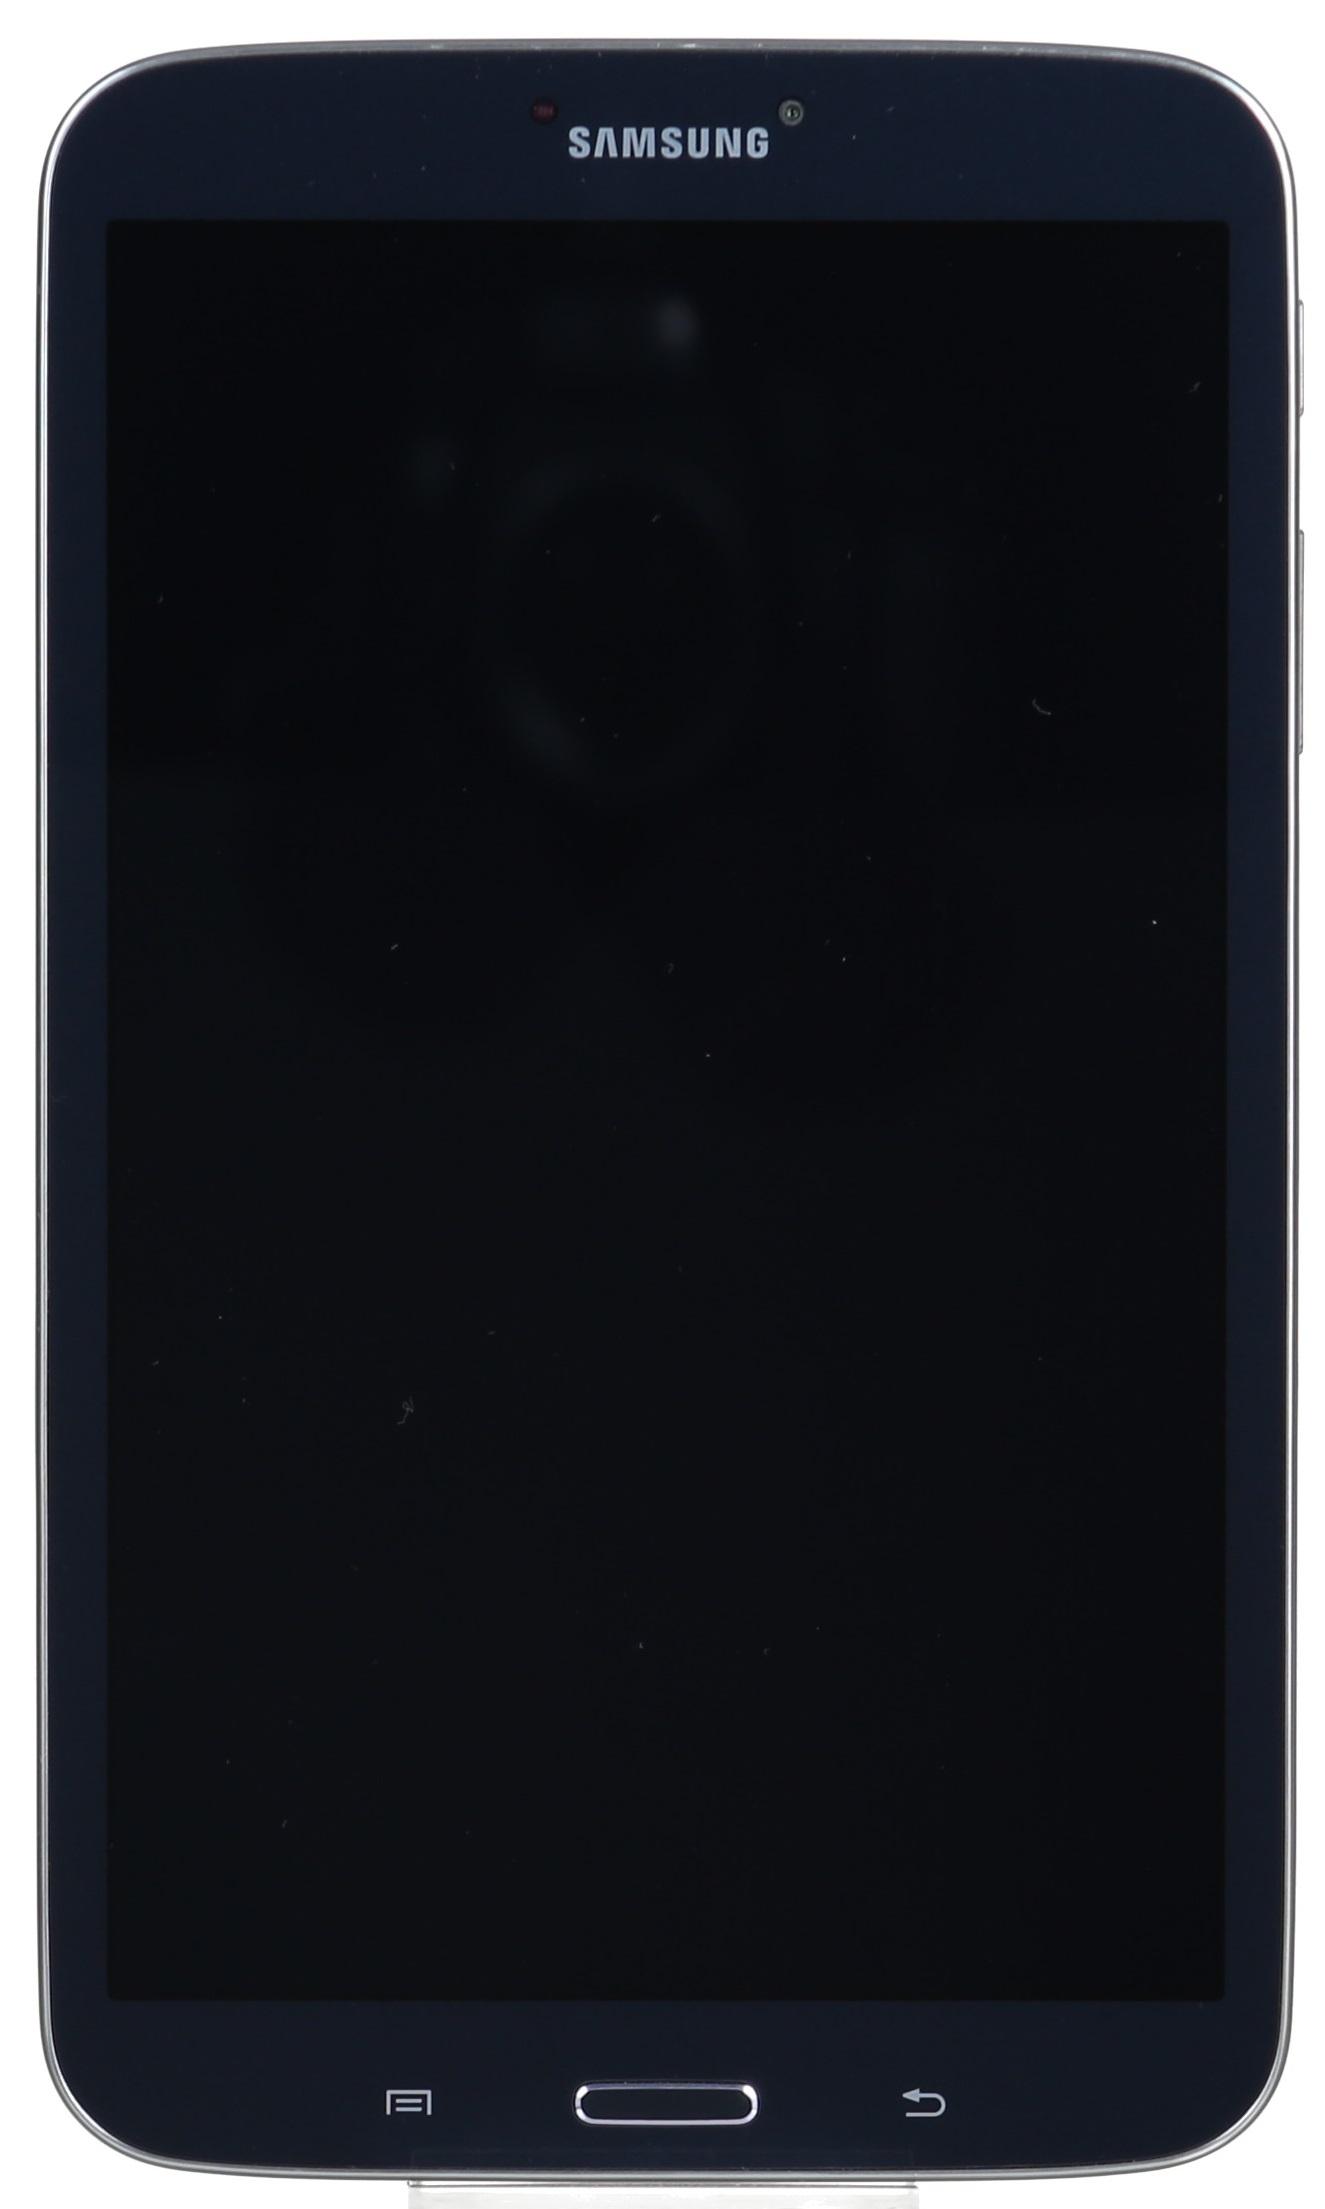 Samsung Galaxy Tab 3 8.0 8 16GB [wifi] zwart